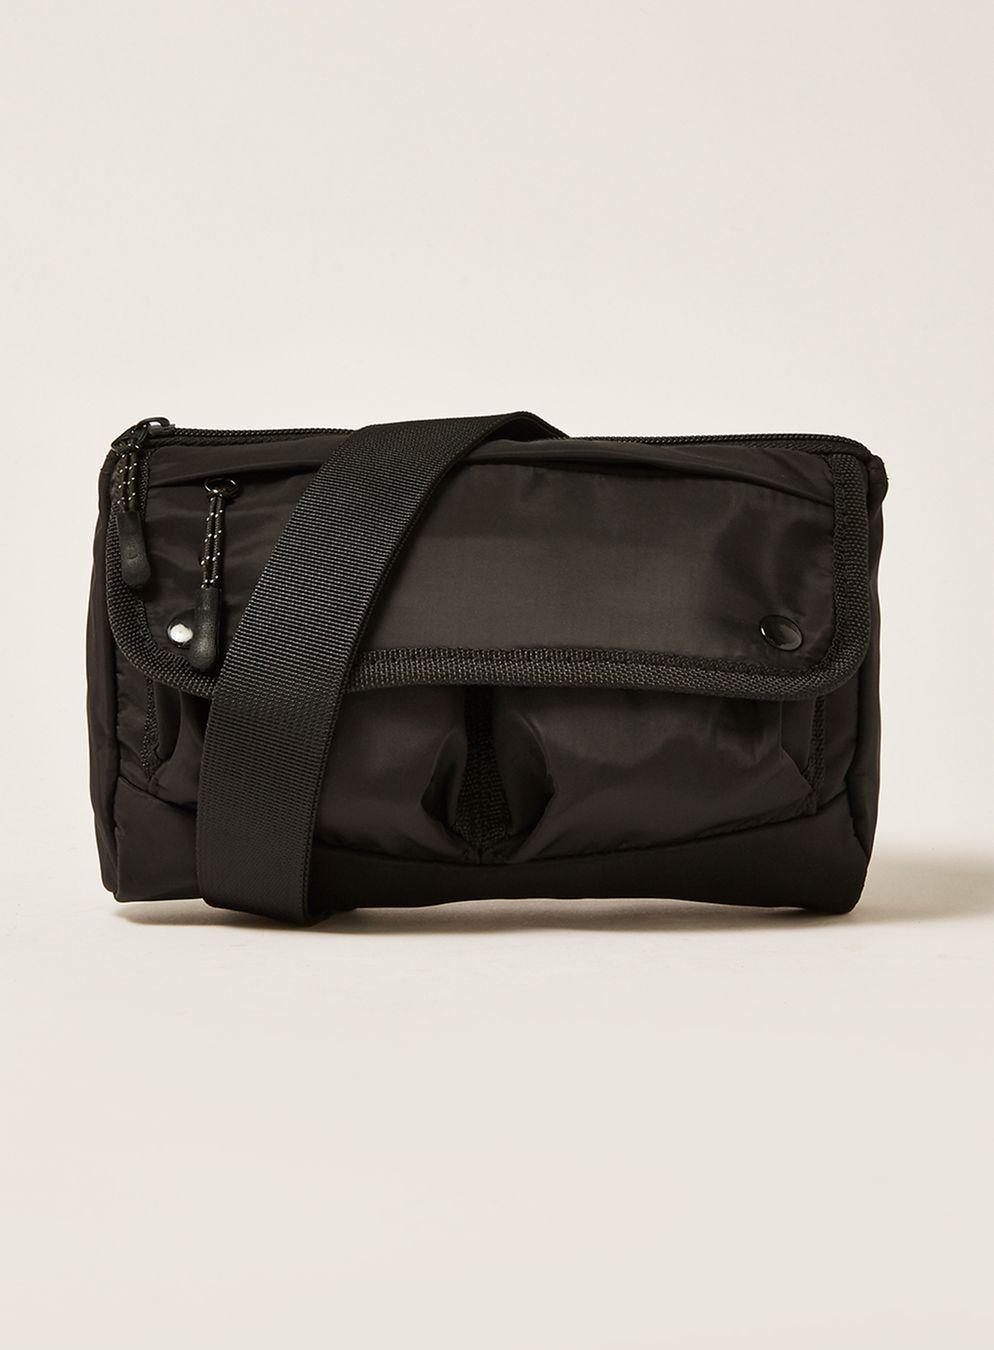 TOPMAN Black Sabre Cross Body Bag in Black for Men - Lyst 5fe3ec09833f7